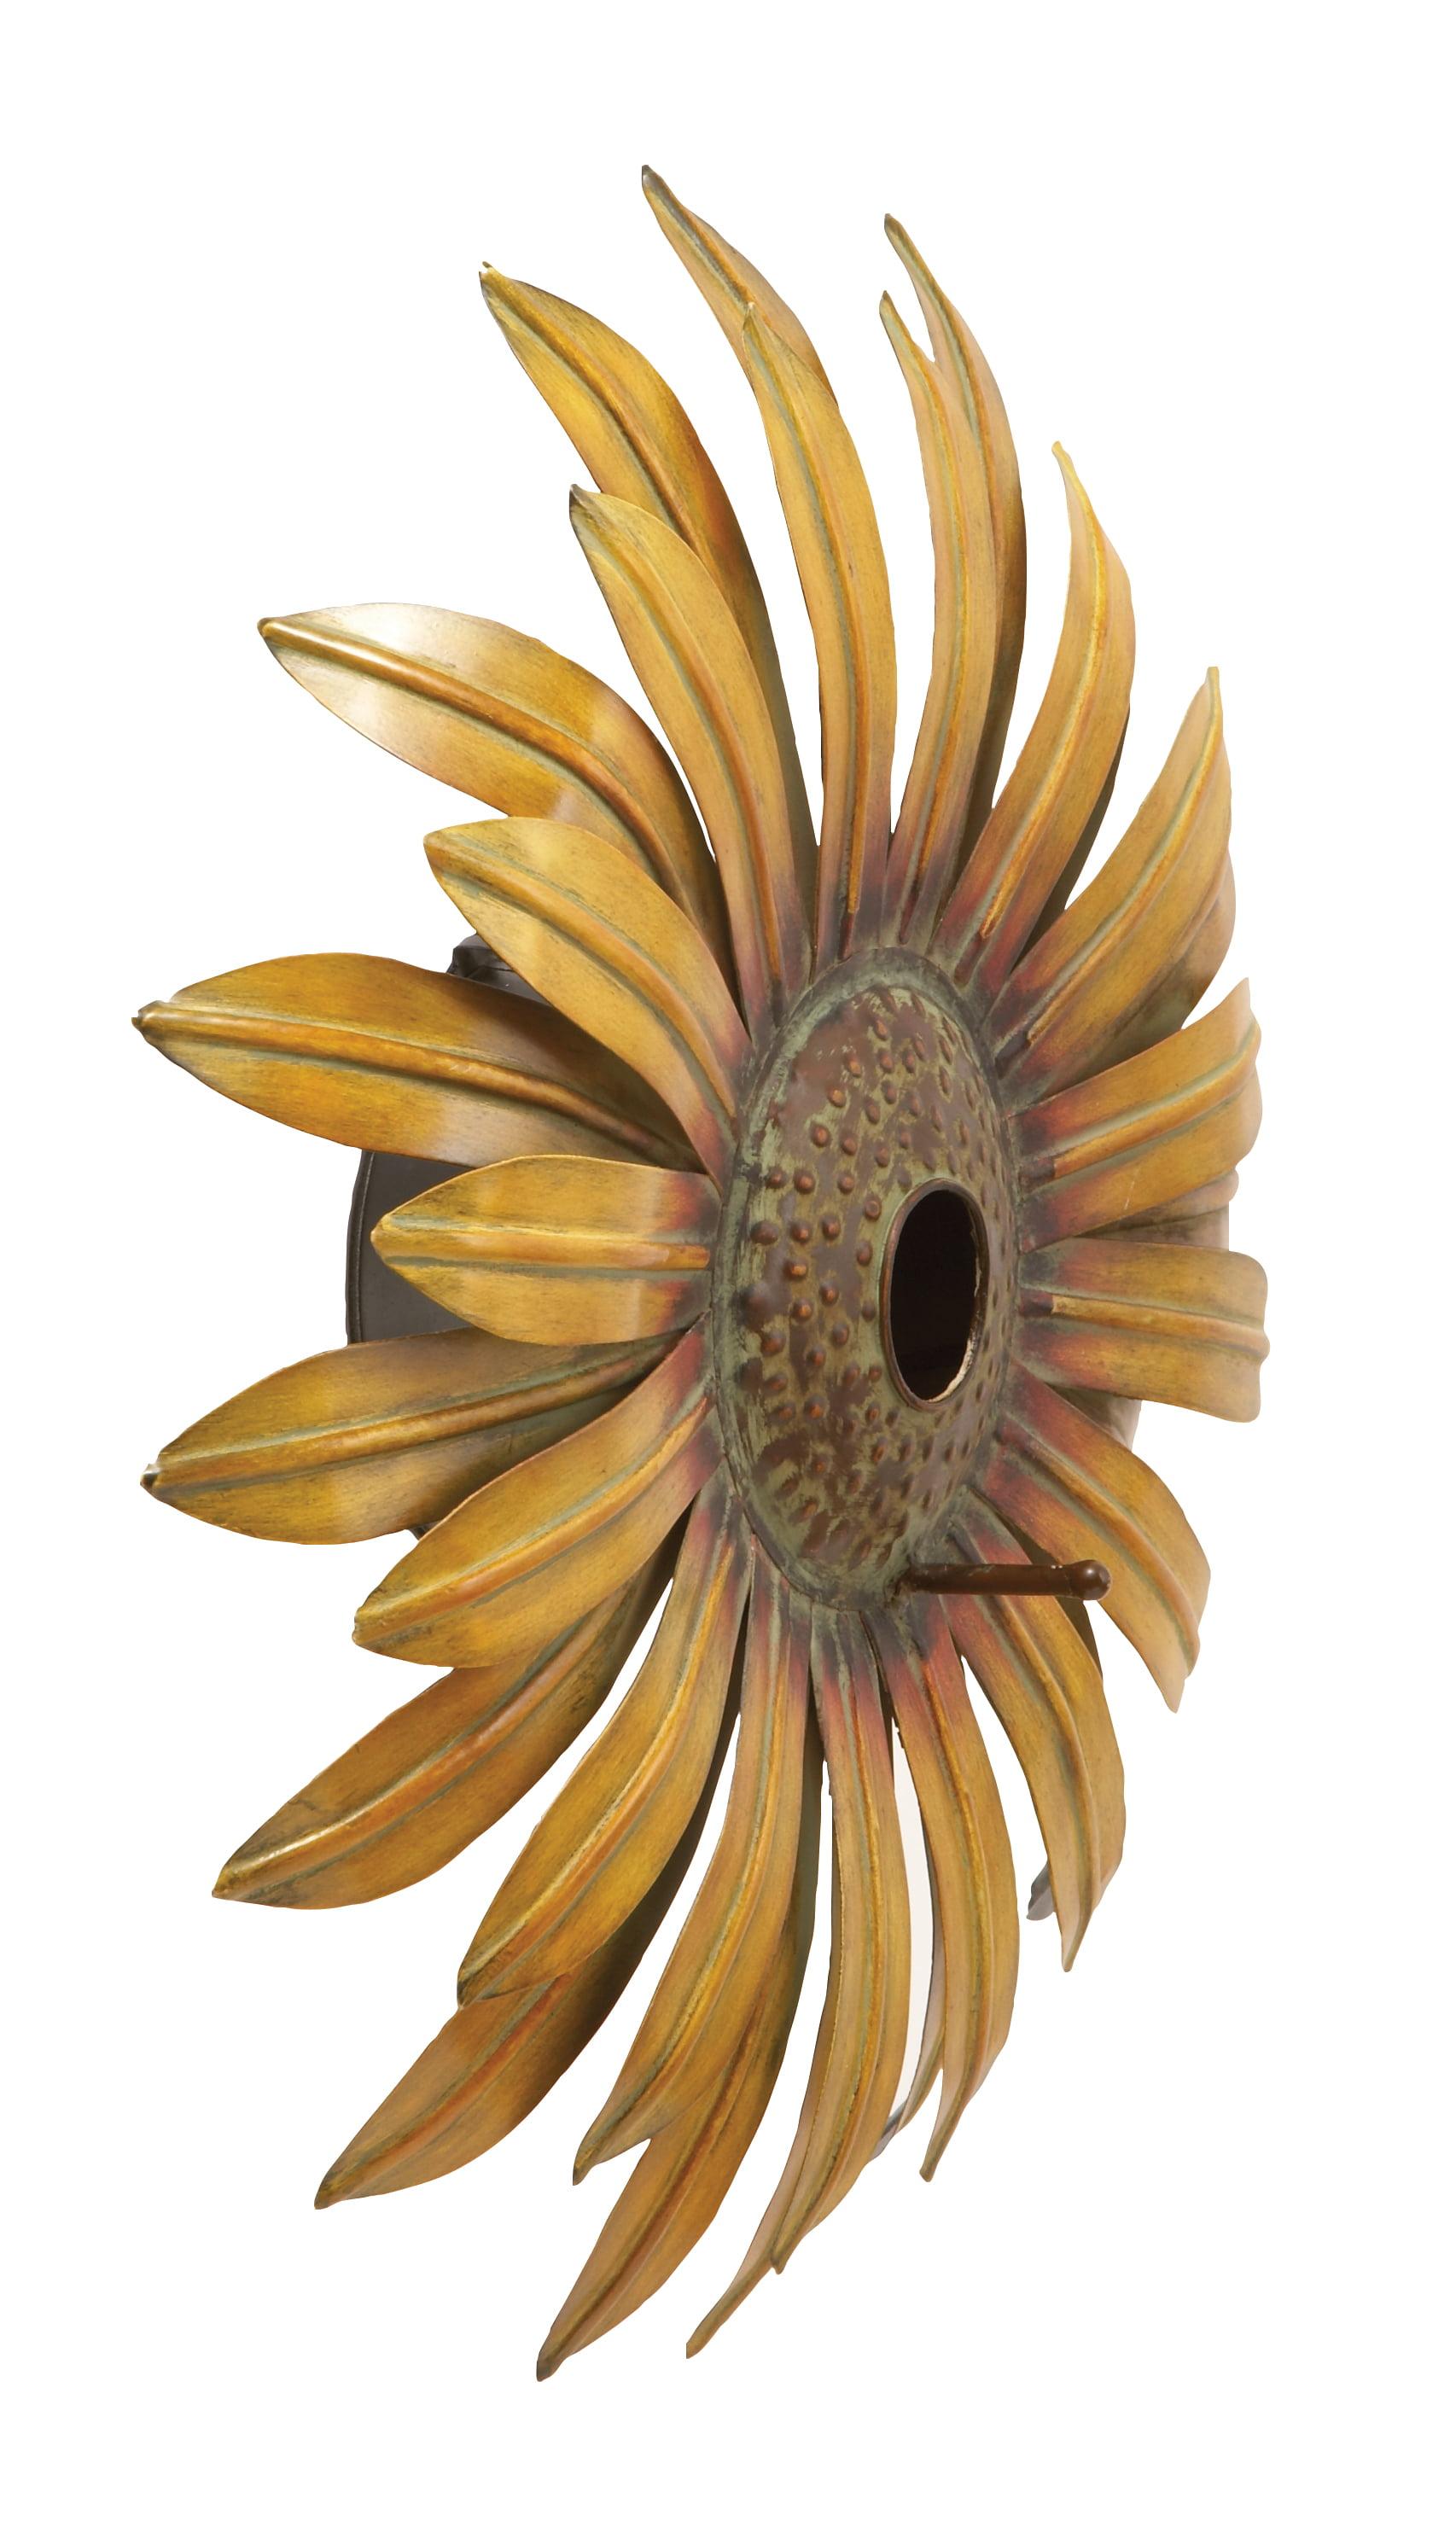 Decmode 16 Inch Modern Yellow Iron Sunflower Birdhouse, Brass Yellow by DecMode